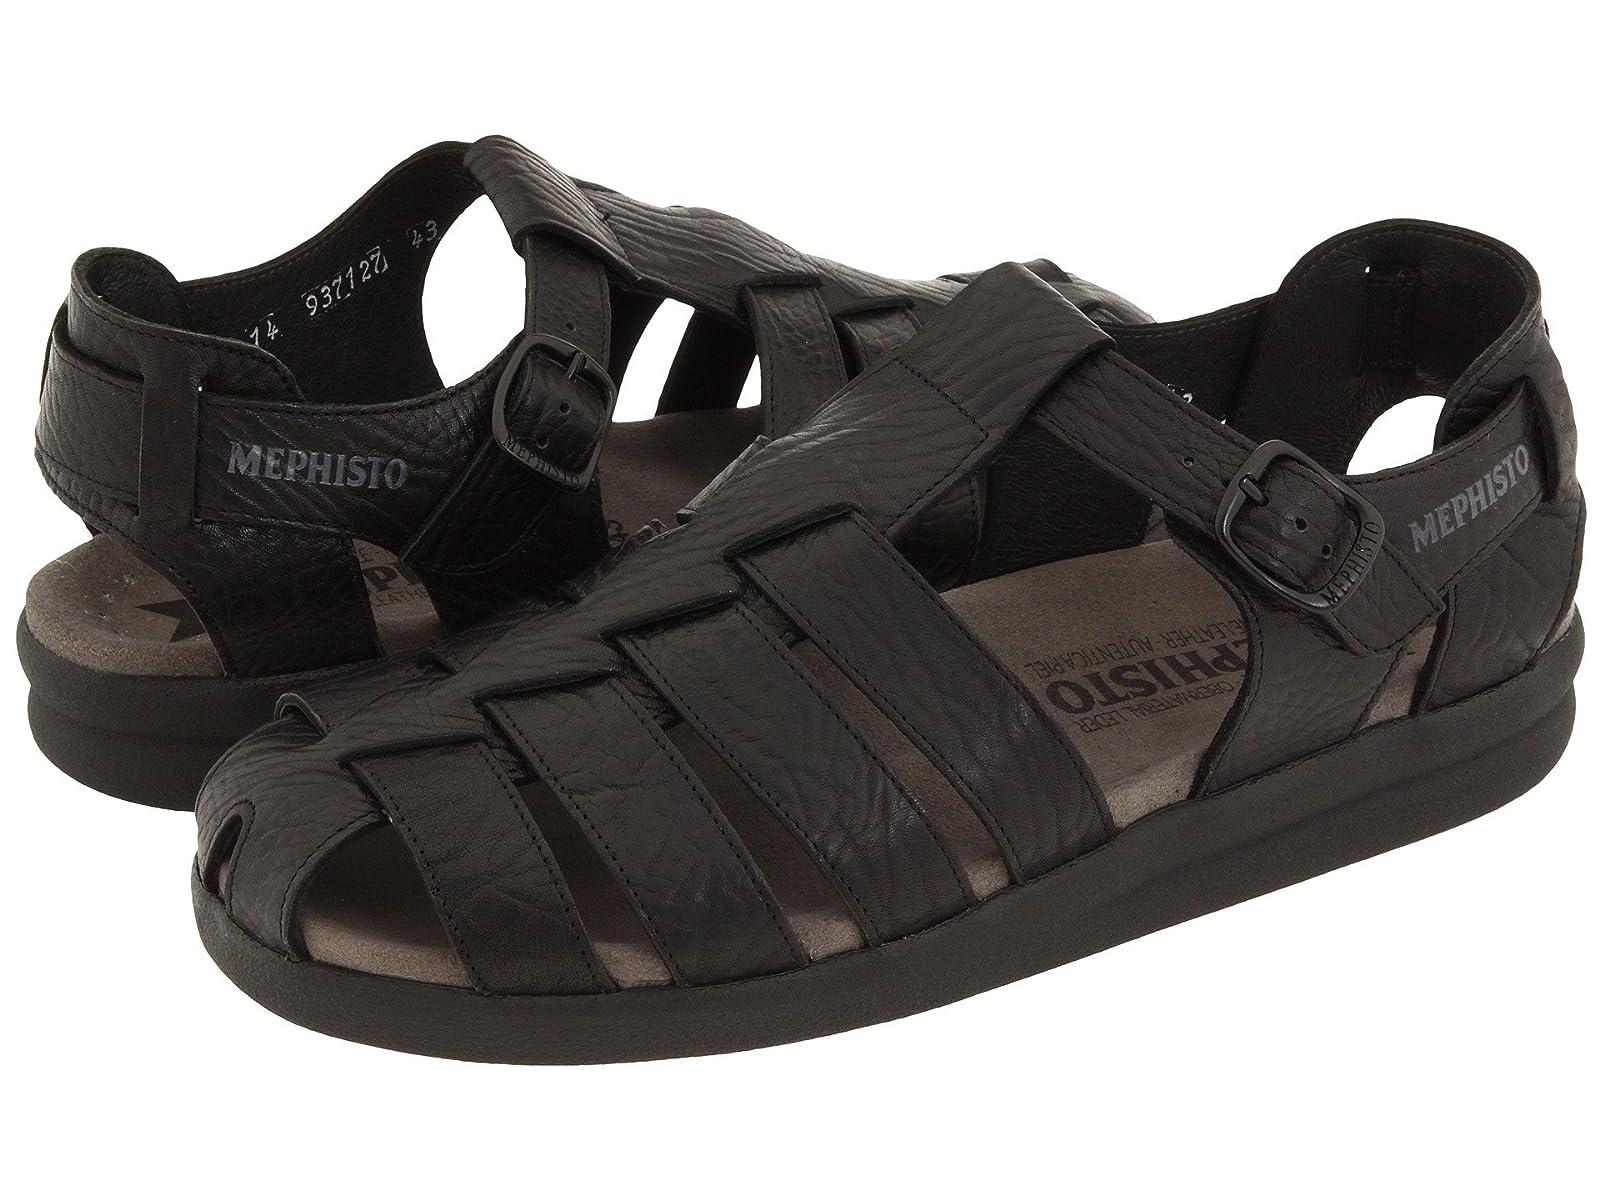 Mephisto SamAtmospheric grades have affordable shoes